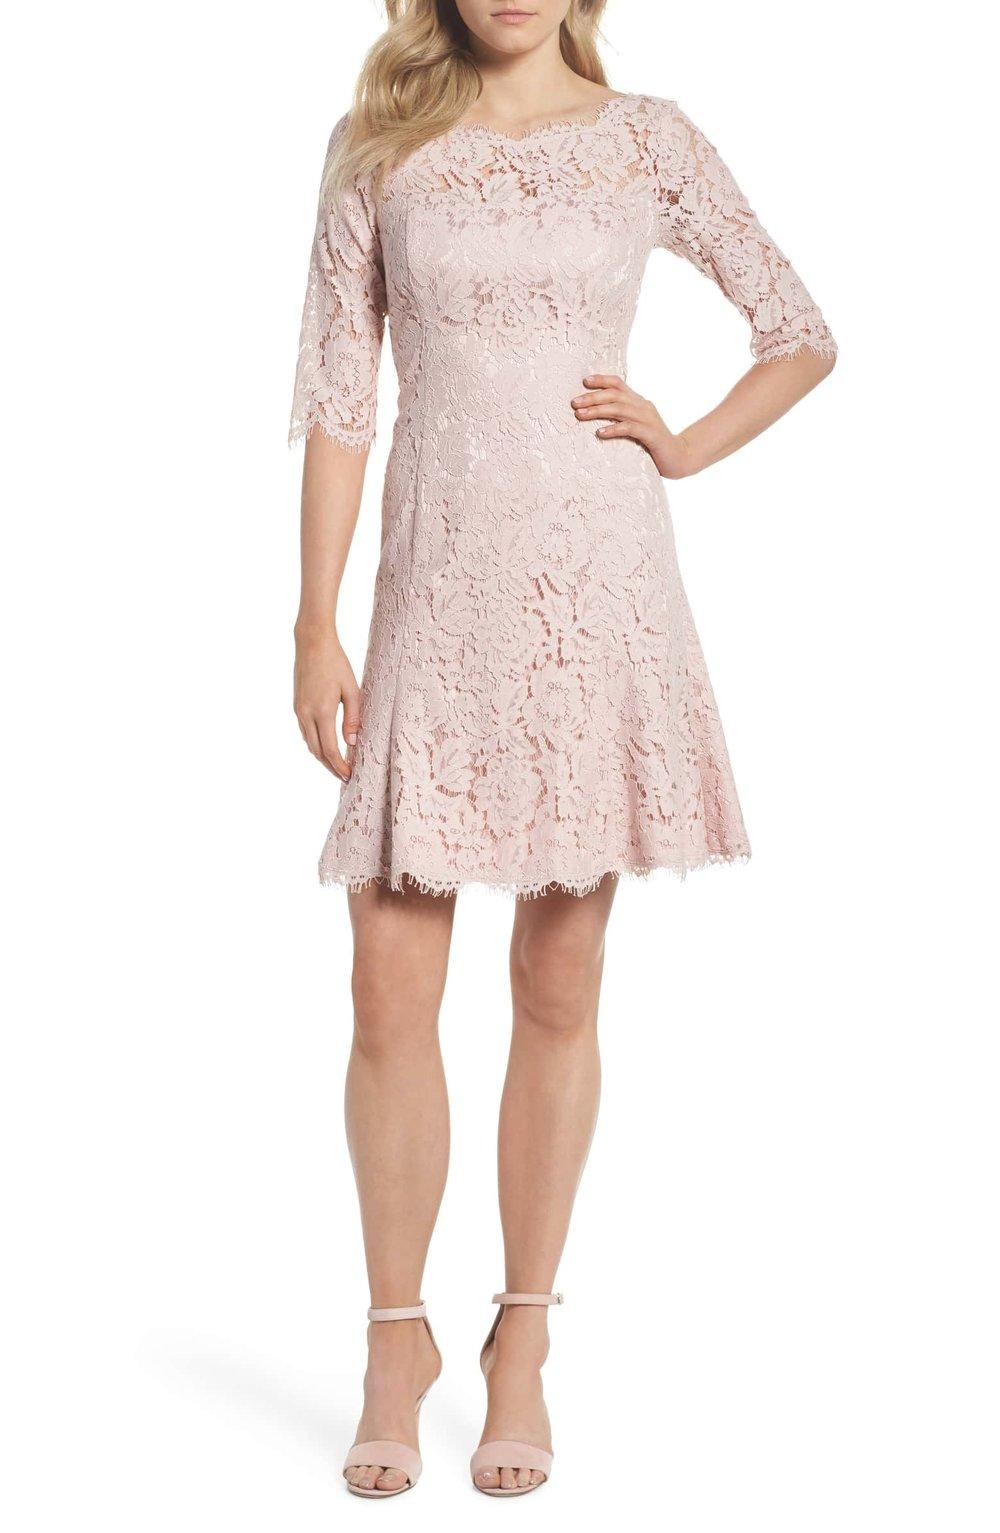 eliza lace cocktail dress.jpg